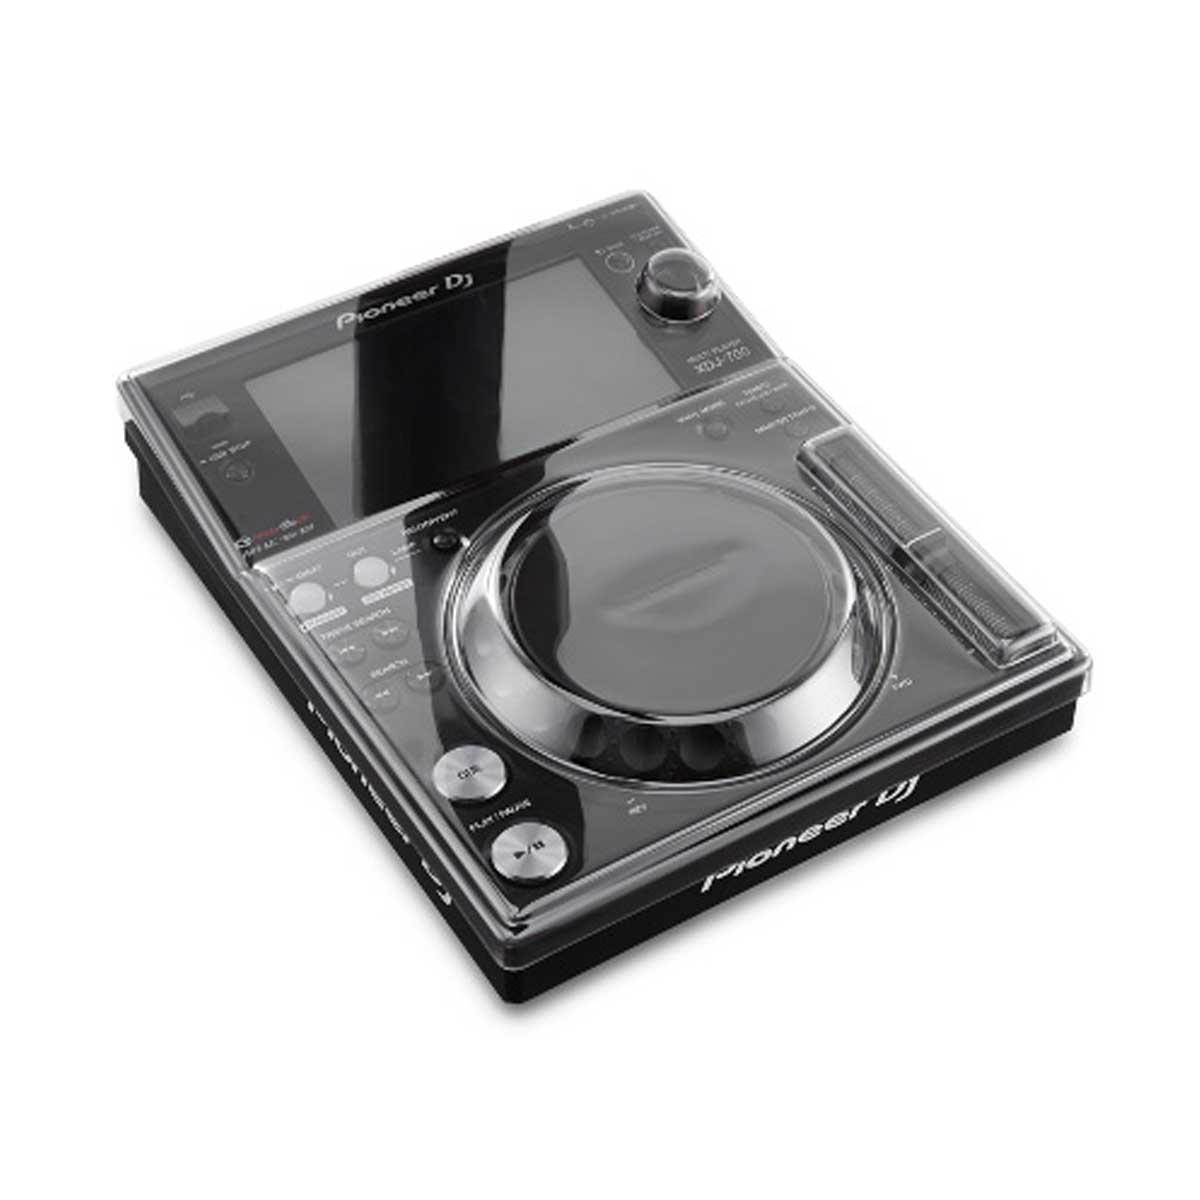 Decksaver デッキセーバー / DS-PC-XDJ700 XDJ-700用保護カバー【お取り寄せ商品】